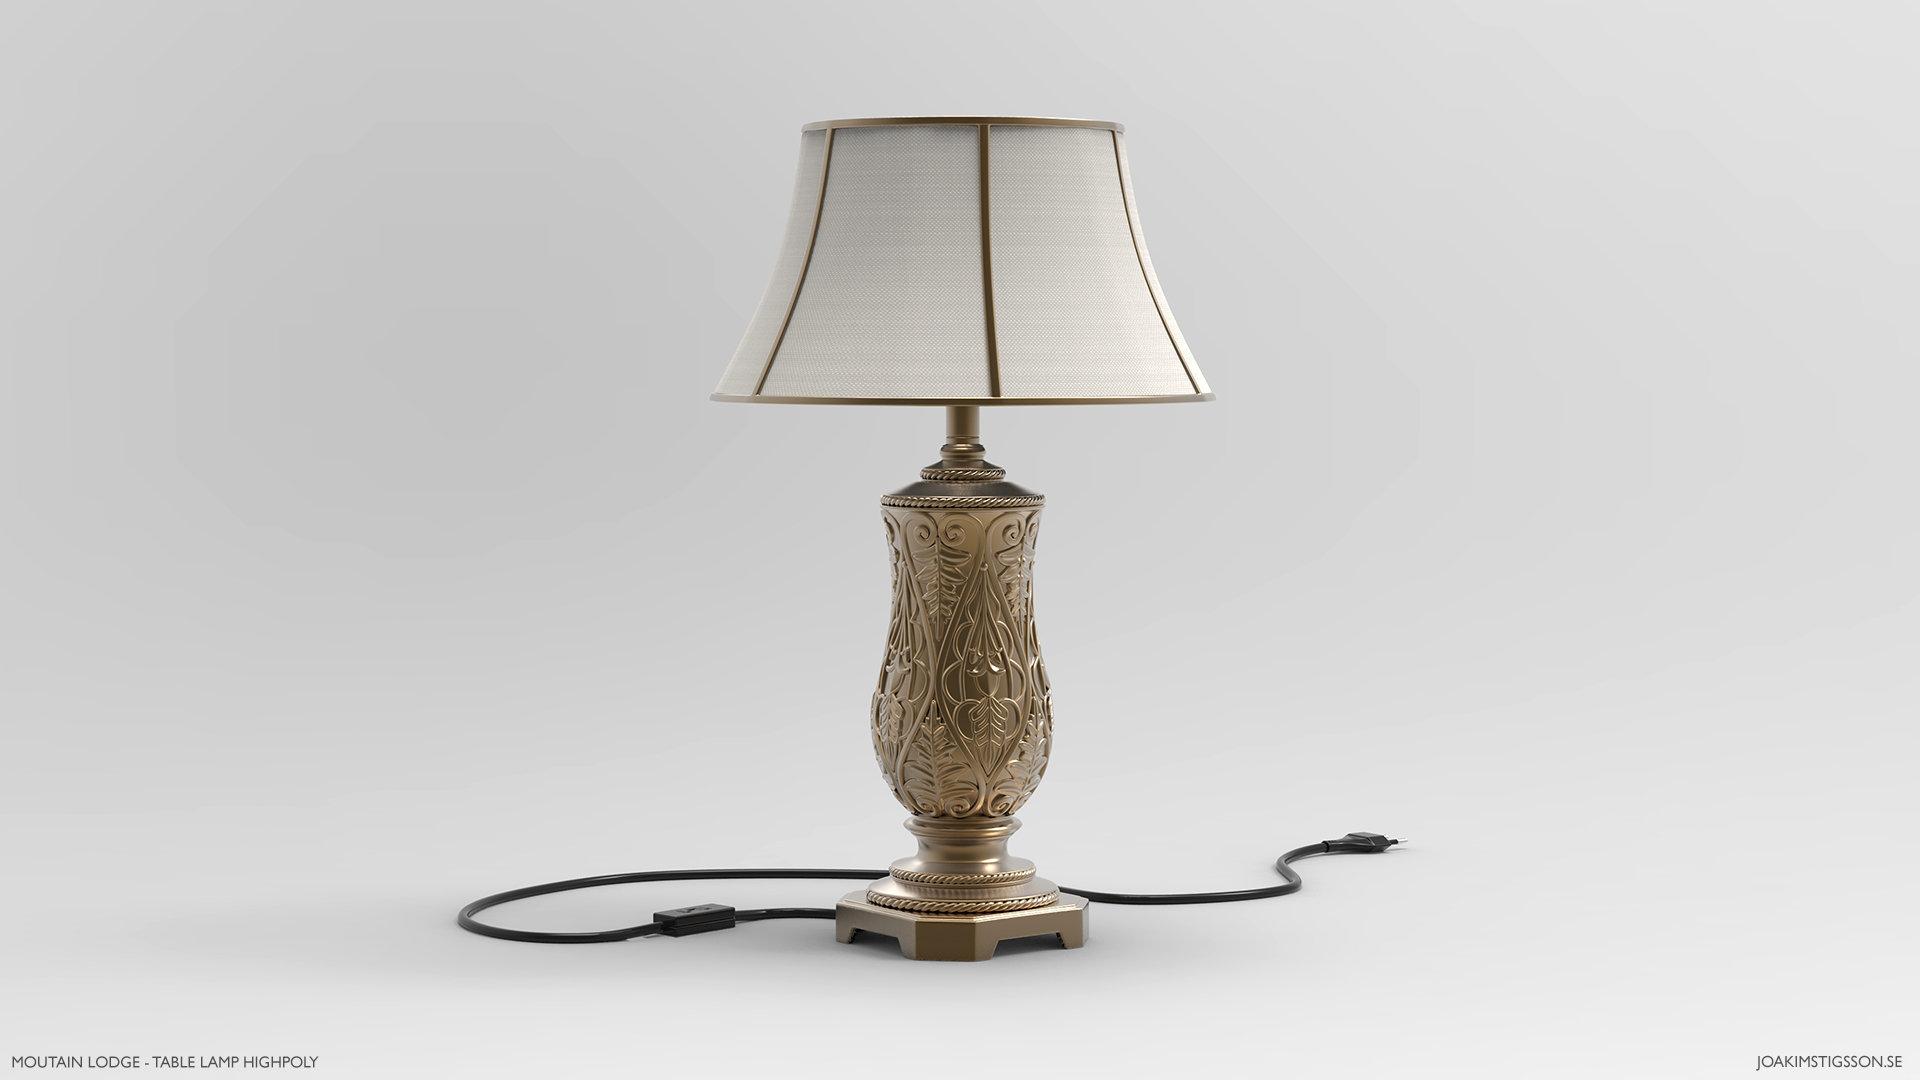 Joakim stigsson table lamp a hp 01